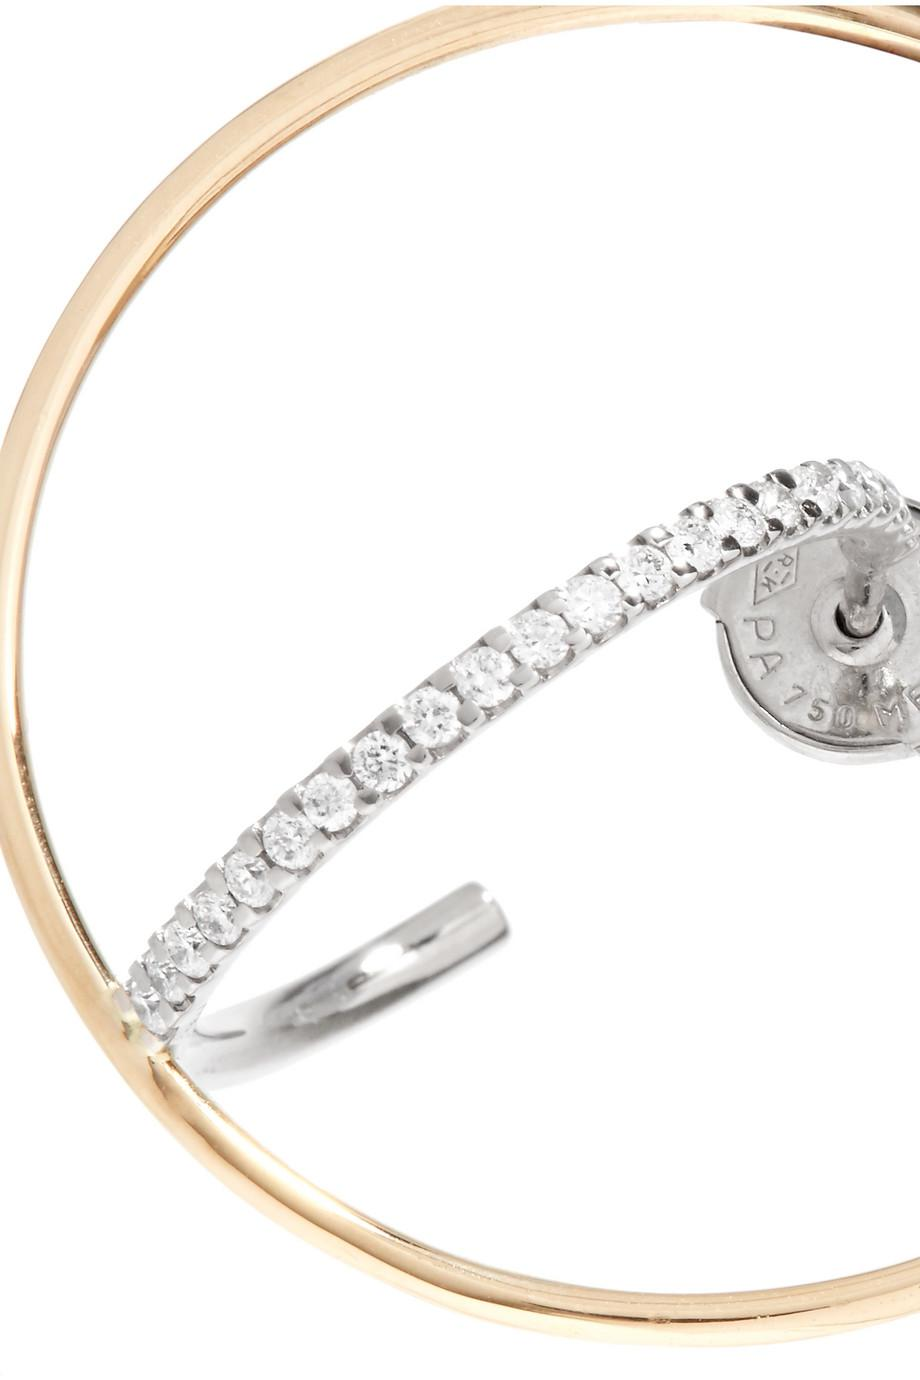 Charlotte Chesnais Saturn 18-karat Gold Diamond Hoop Earring M3WhY